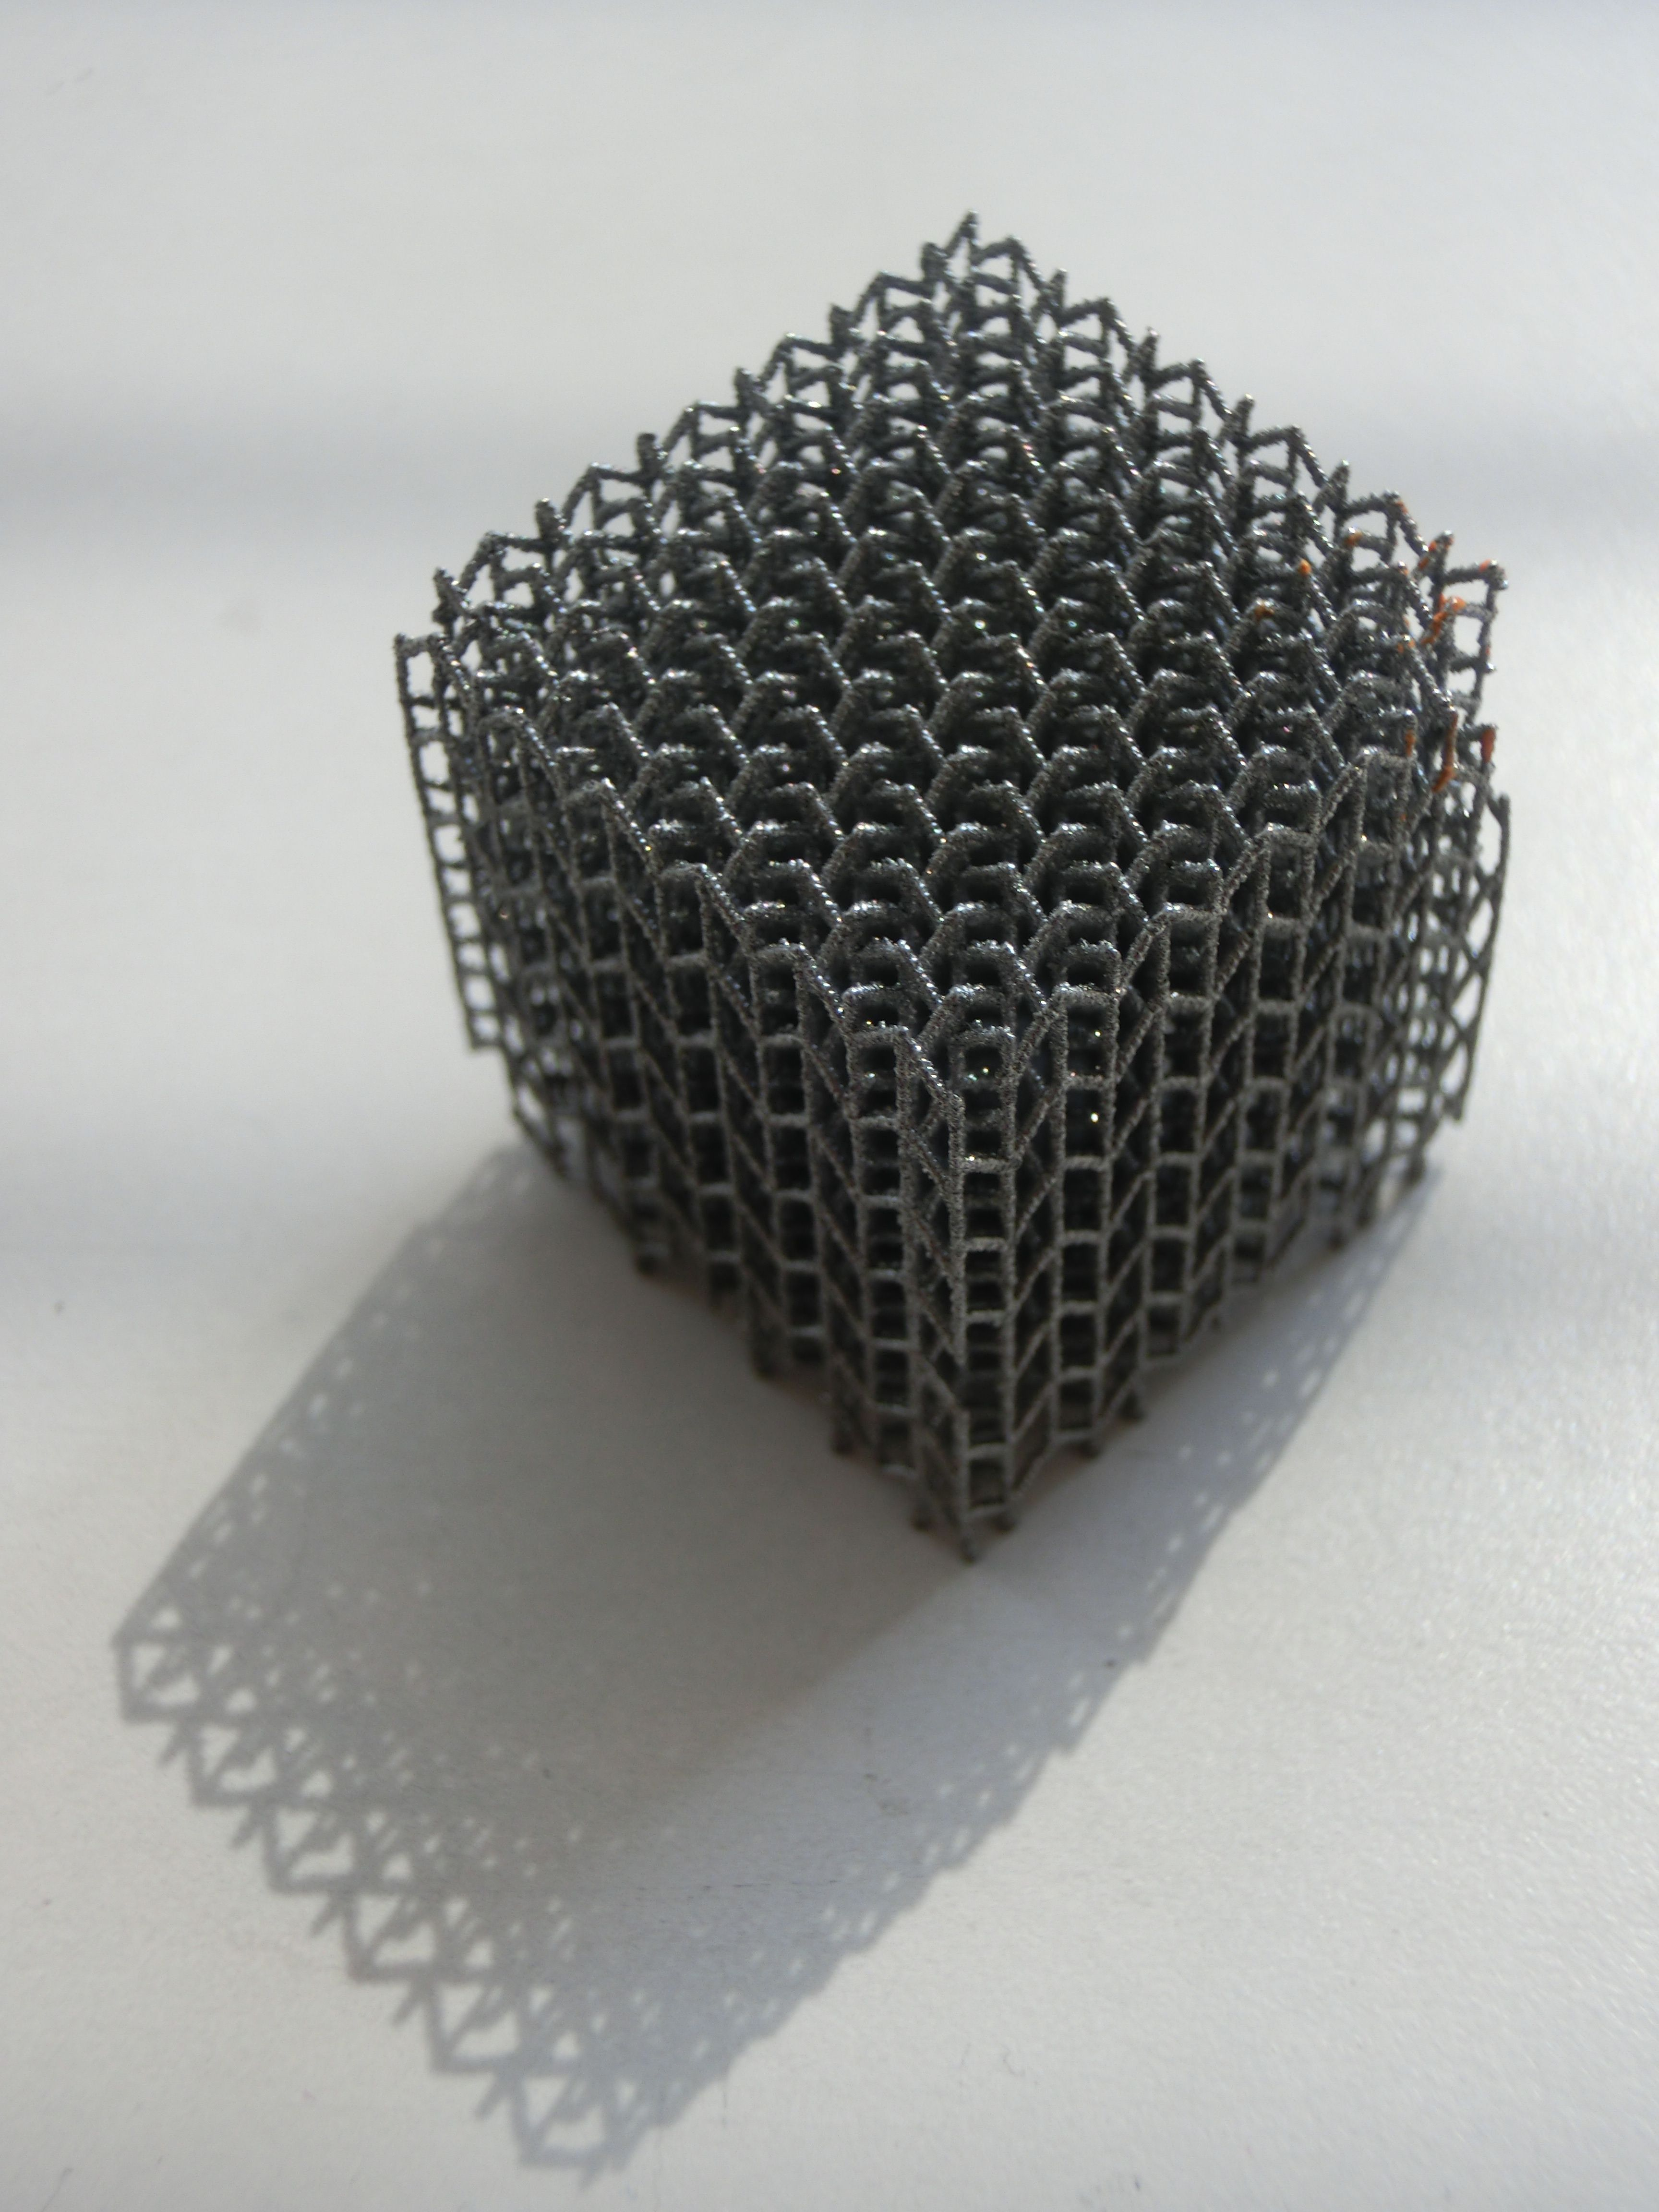 3D printed metal design by Polyshape 3d printed metal